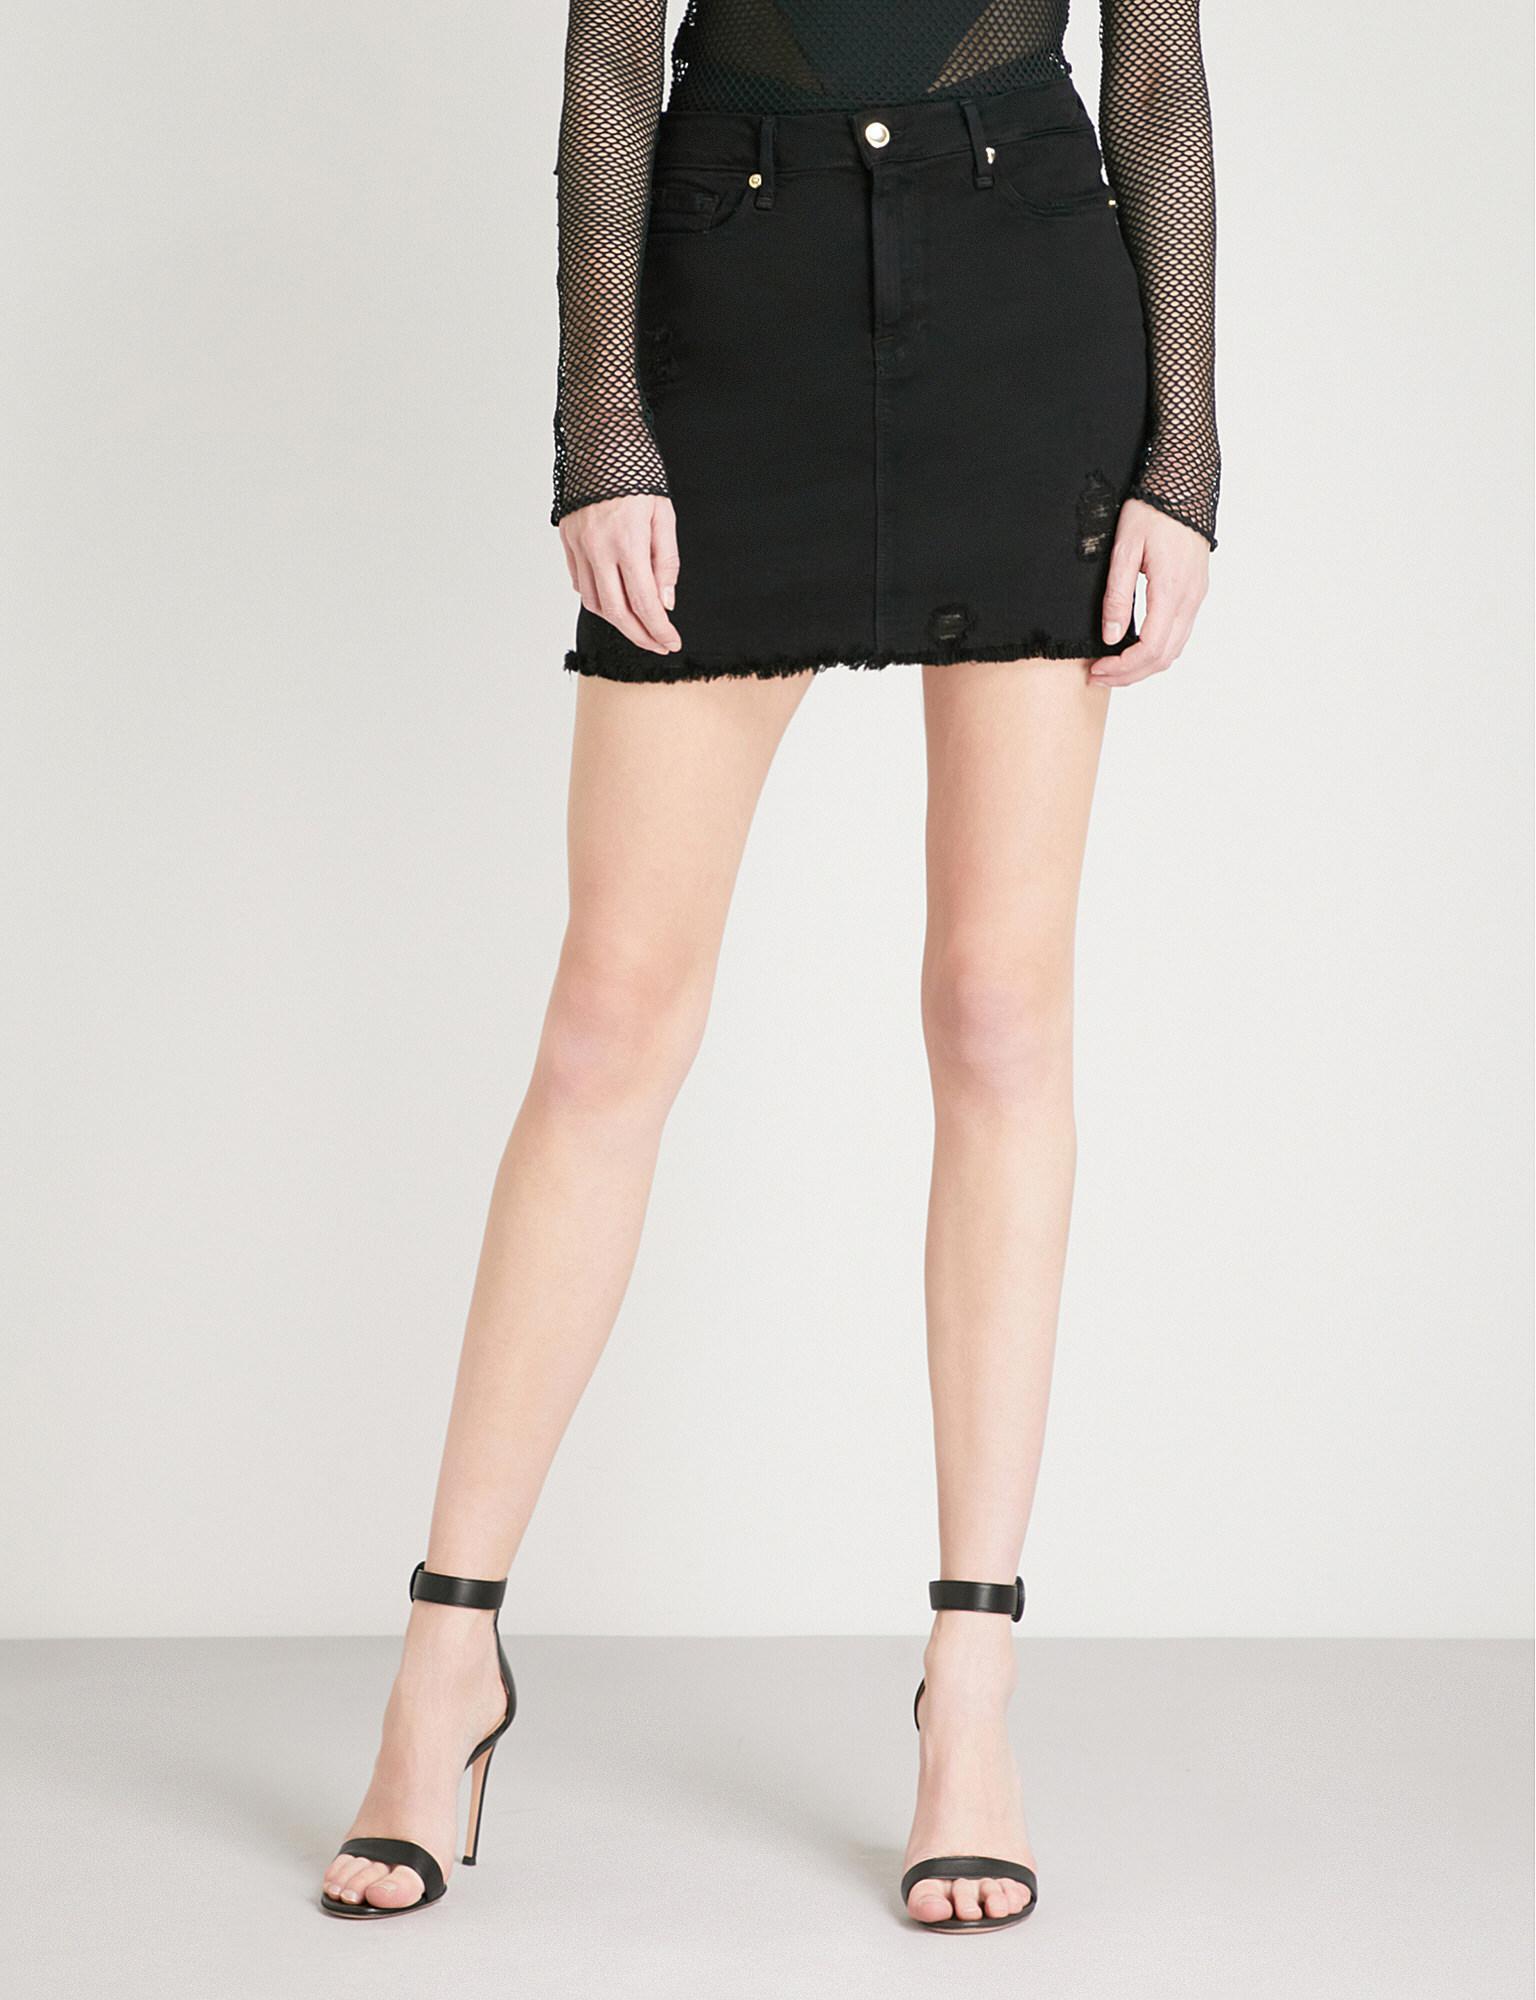 1536c86a9b1 Black Stretch Denim Skirt - Data Dynamic AG